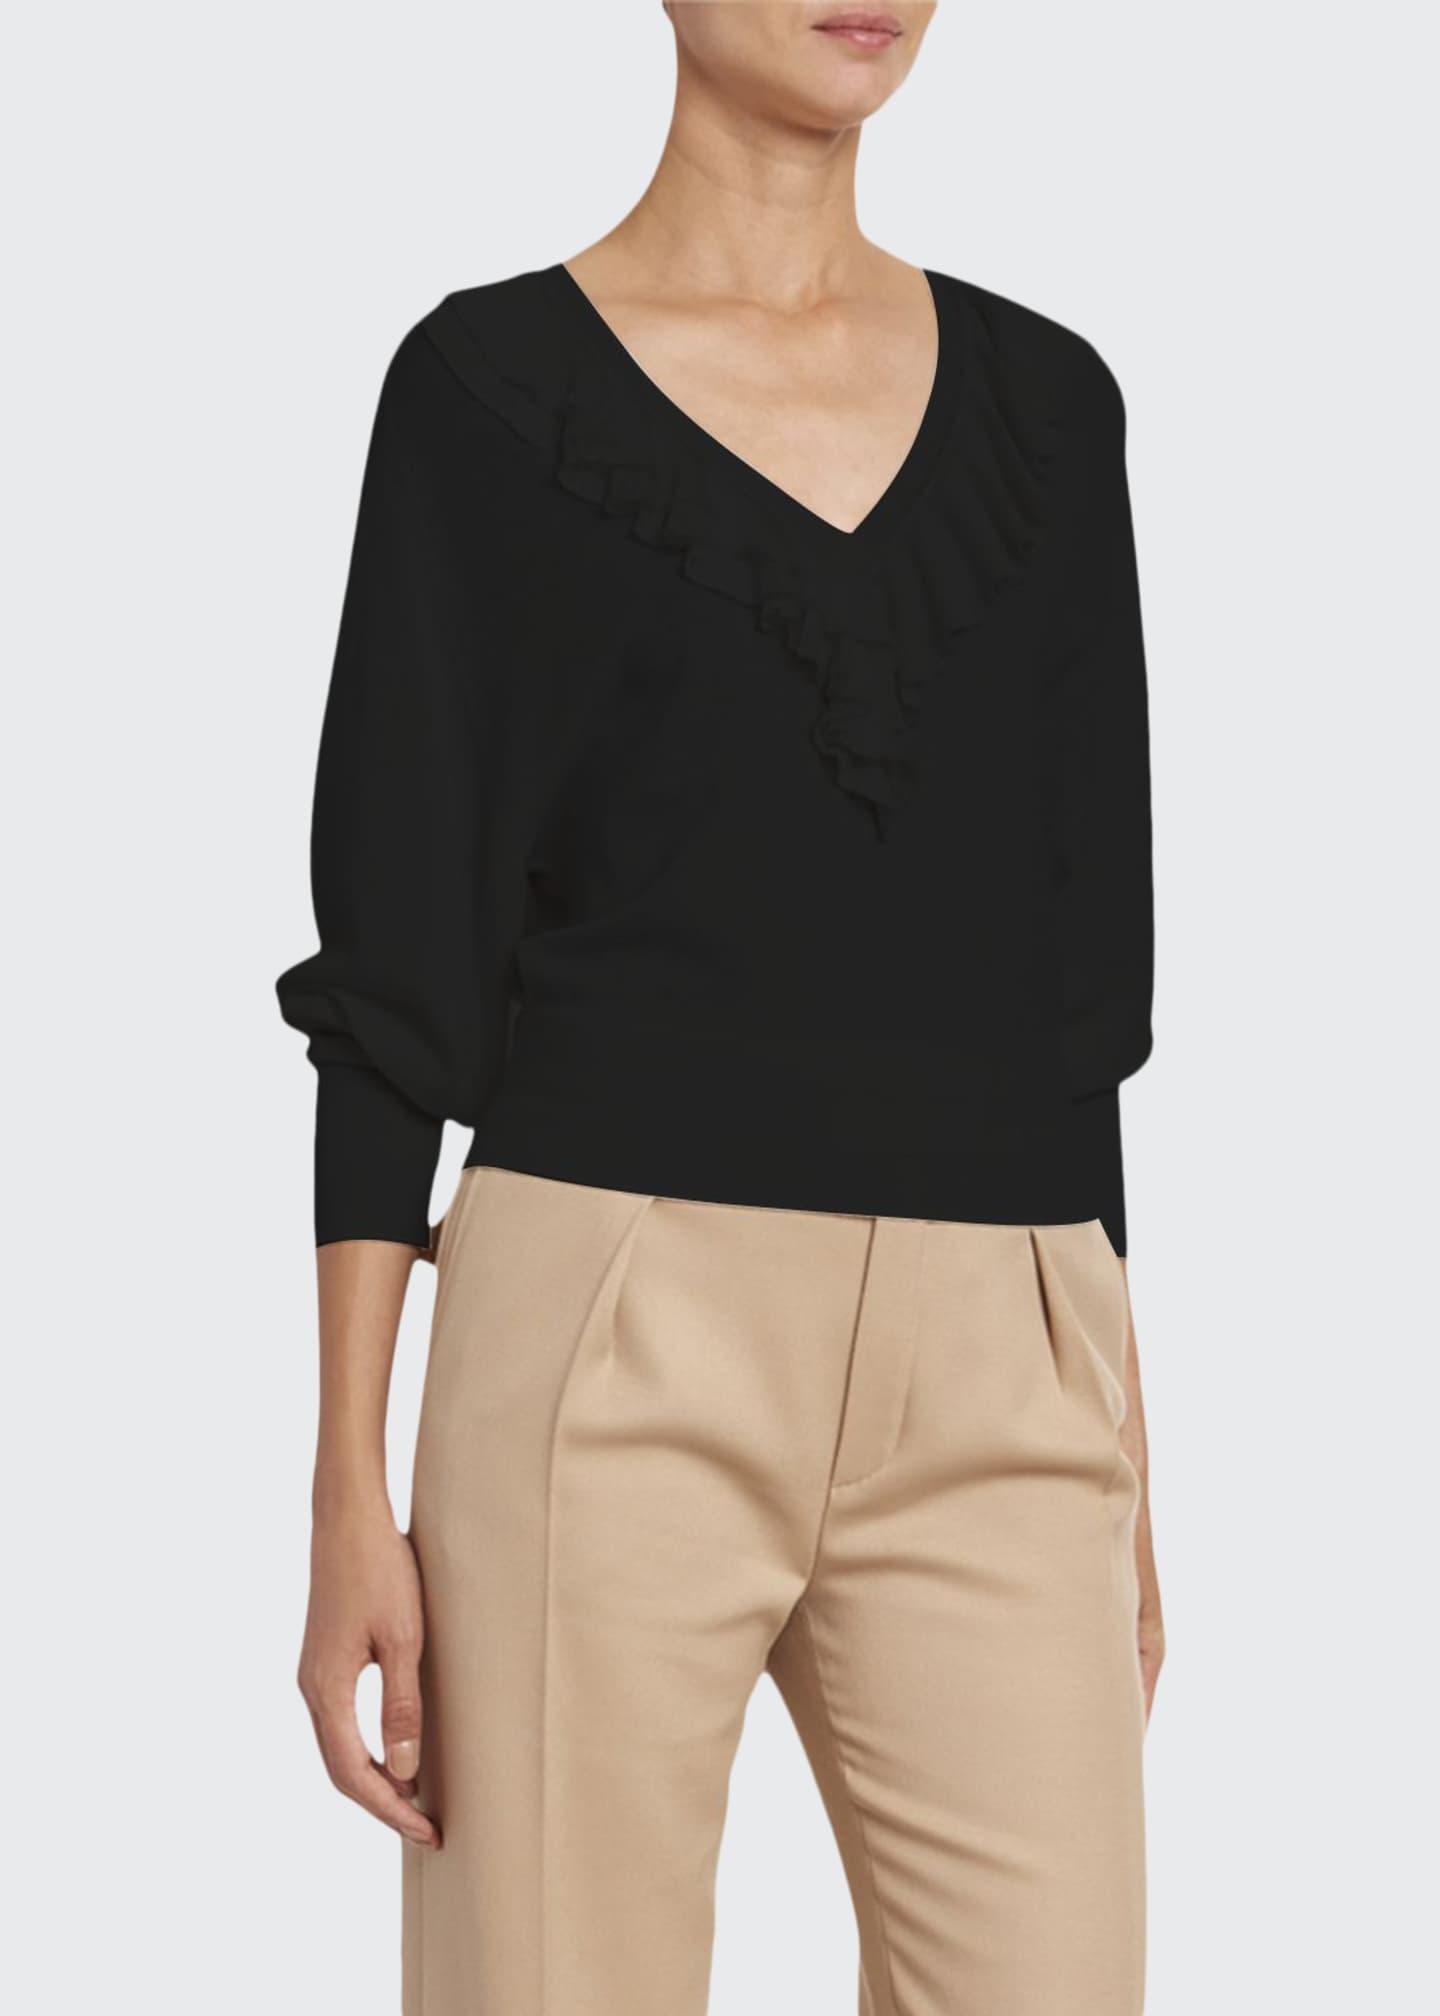 Chloe Wool Ruffled V-Neck Sweater